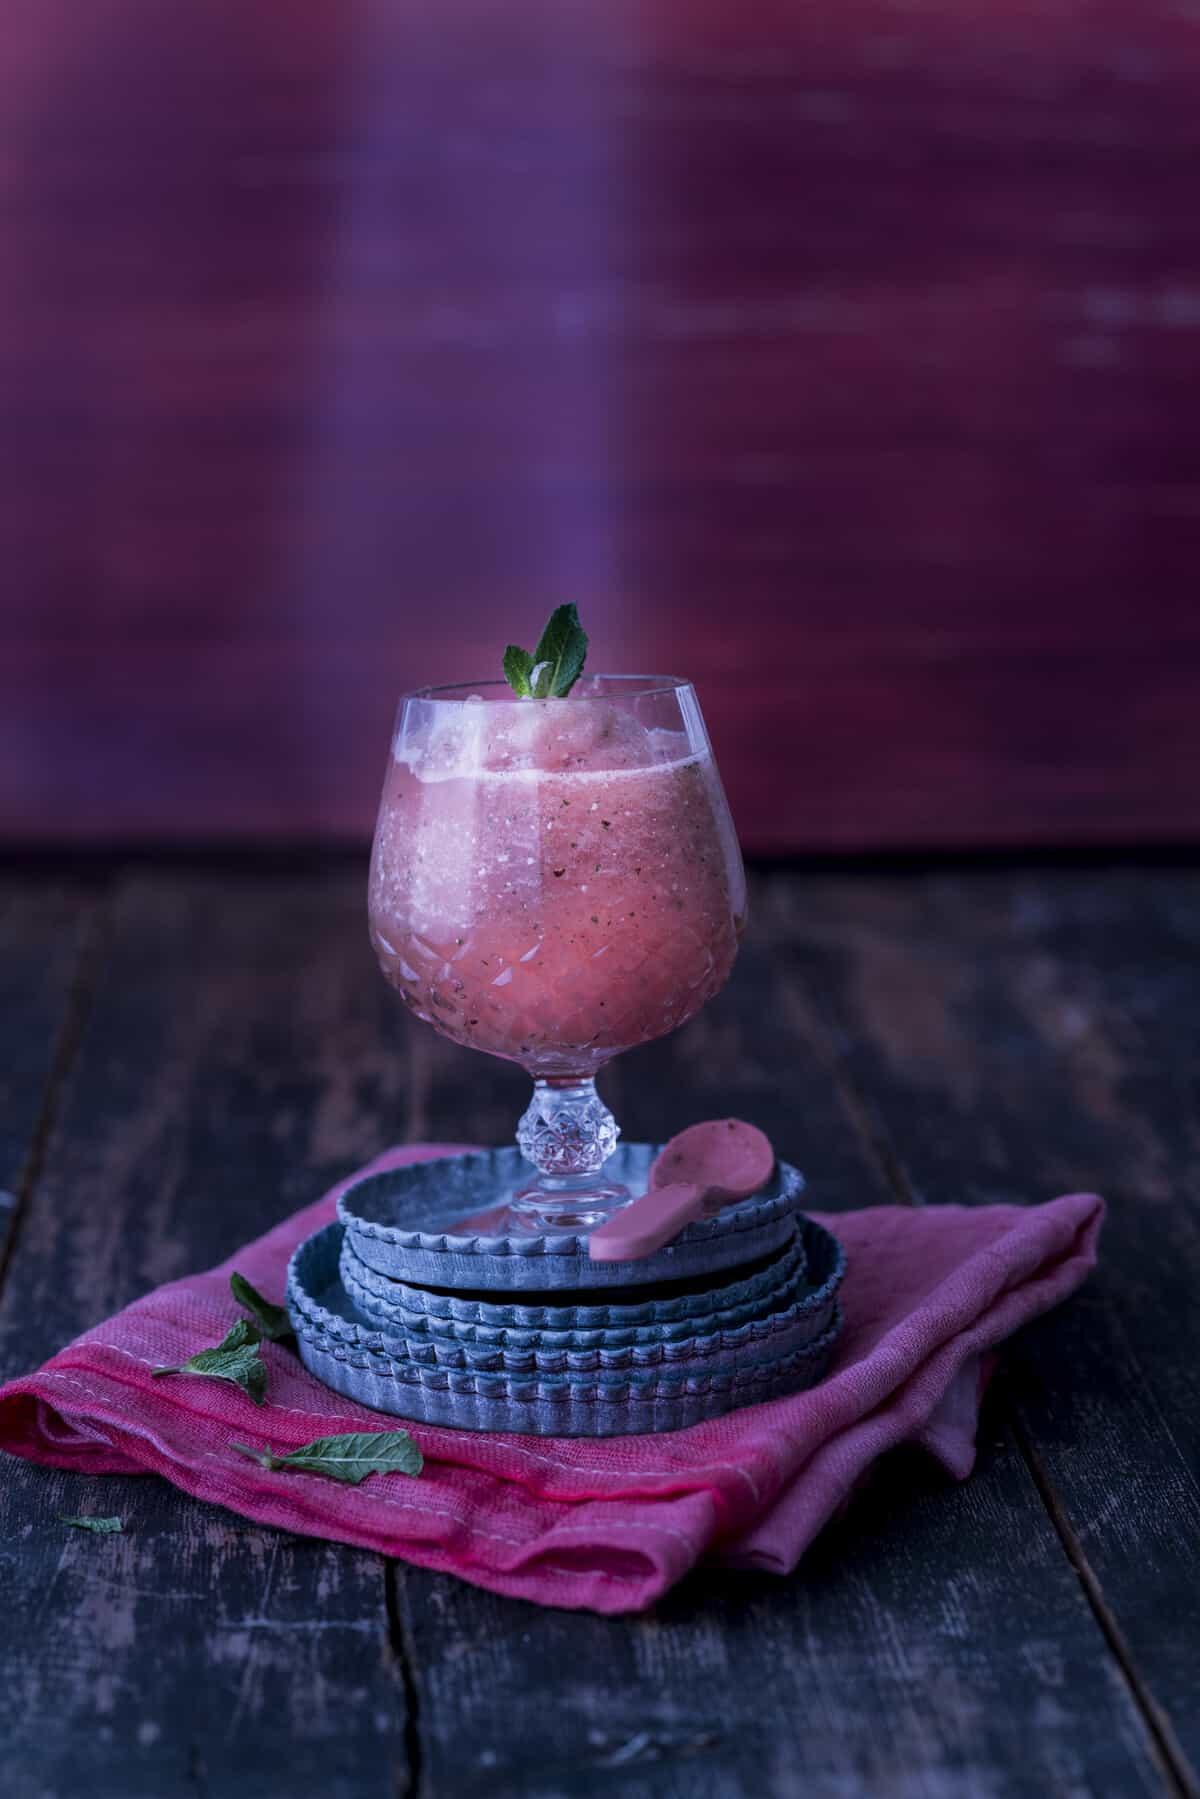 Wine Slush aus dem Thermomix® – Foto: Tina Bumann